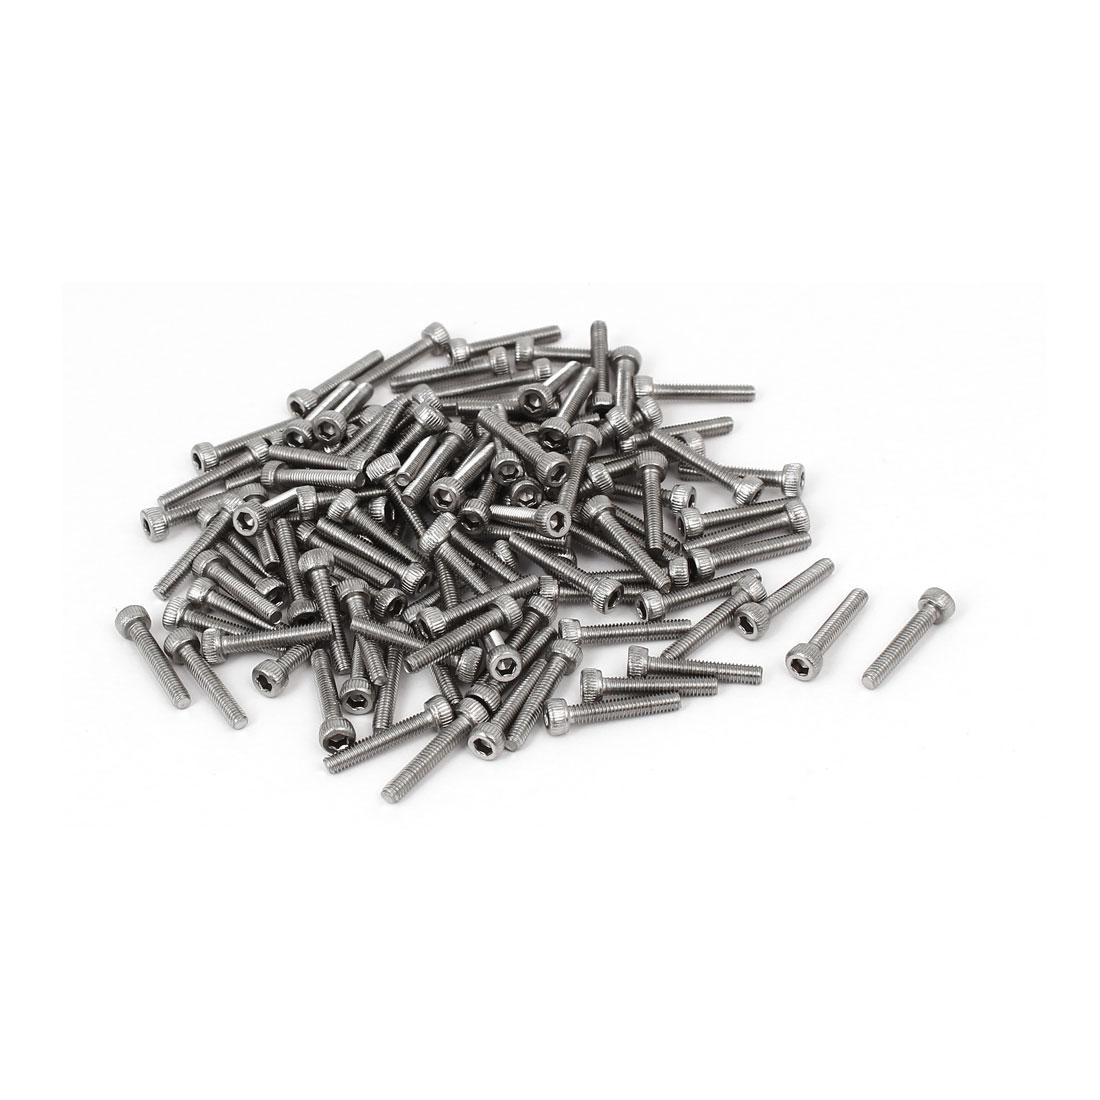 M2.5 x 12mm Thread 304 Stainless Steel Hex Socket Head Cap Screw DIN912 120pcs